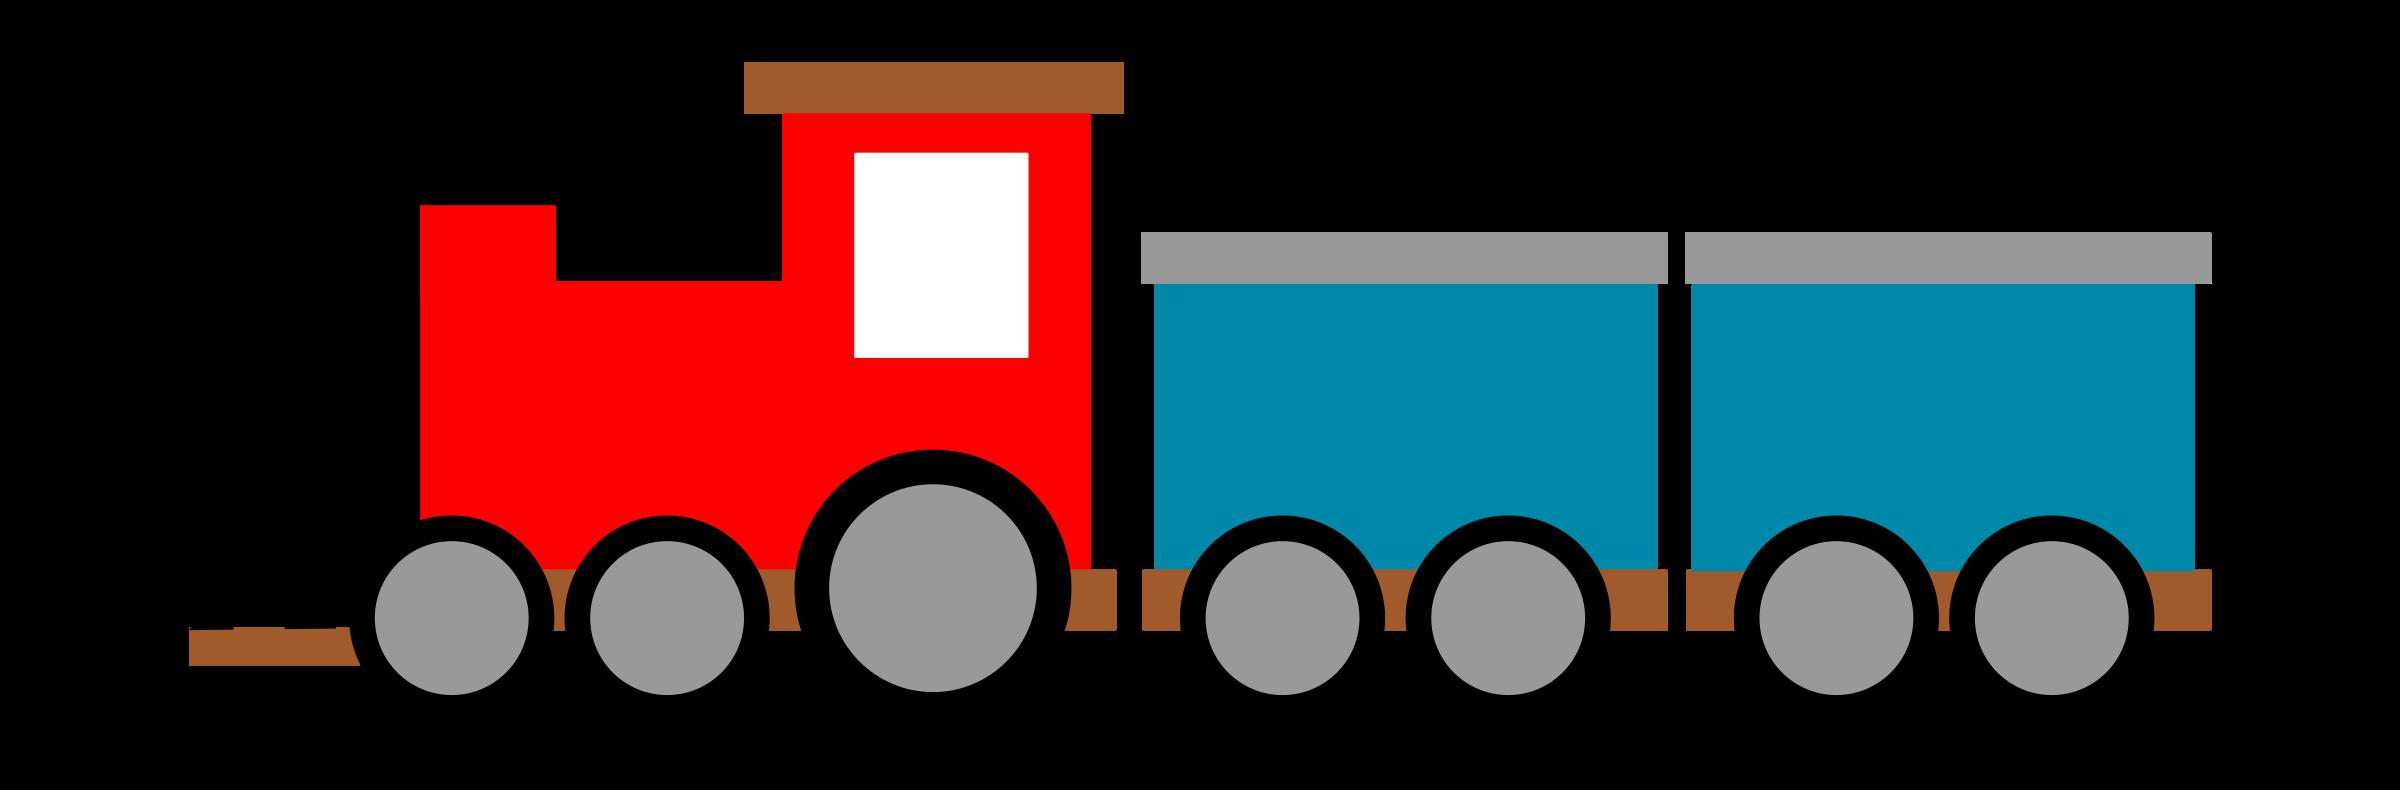 Locomotive clipart choo choo train  on Free Art Free